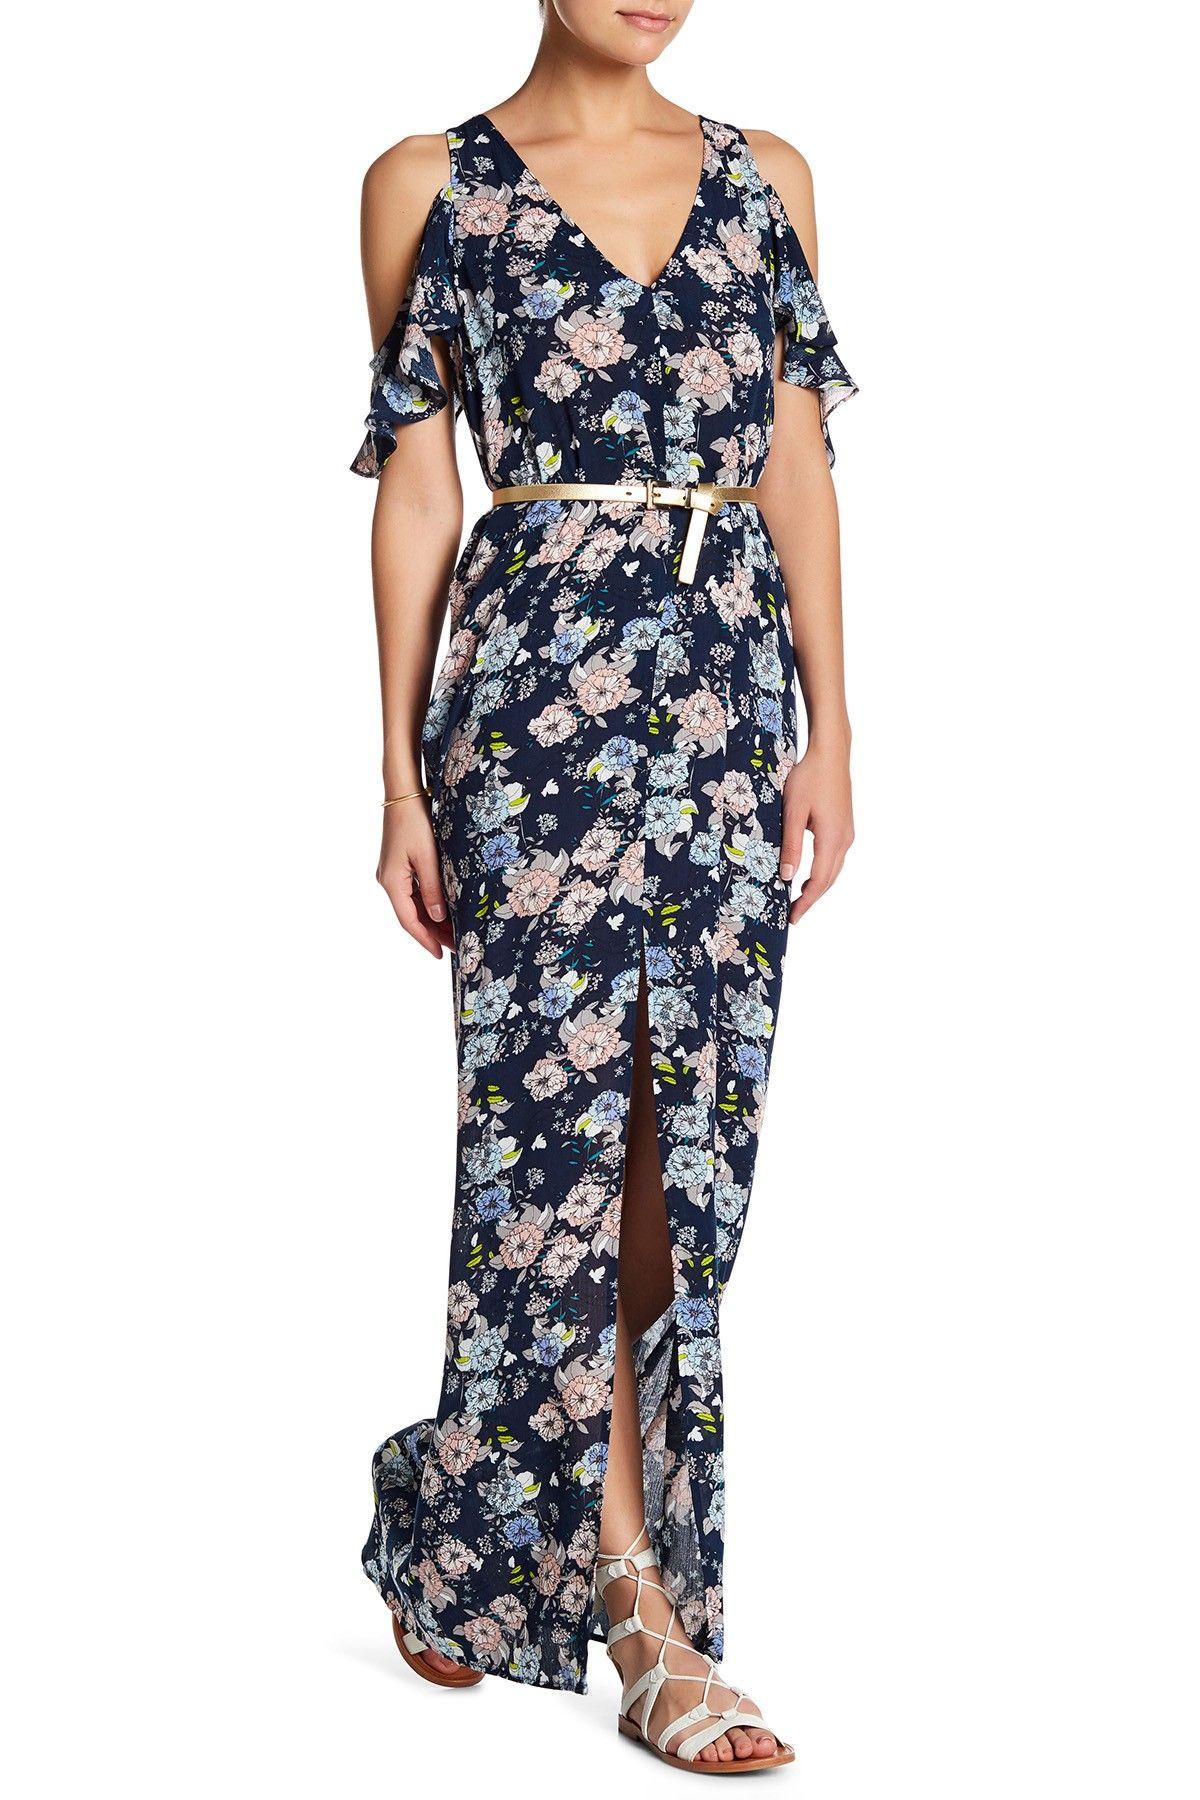 Love Ady Cold Shoulder Ruffle Maxi Dress Nordstrom Rack Maxi Dress Ruffled Maxi Dress Dresses [ 1800 x 1200 Pixel ]